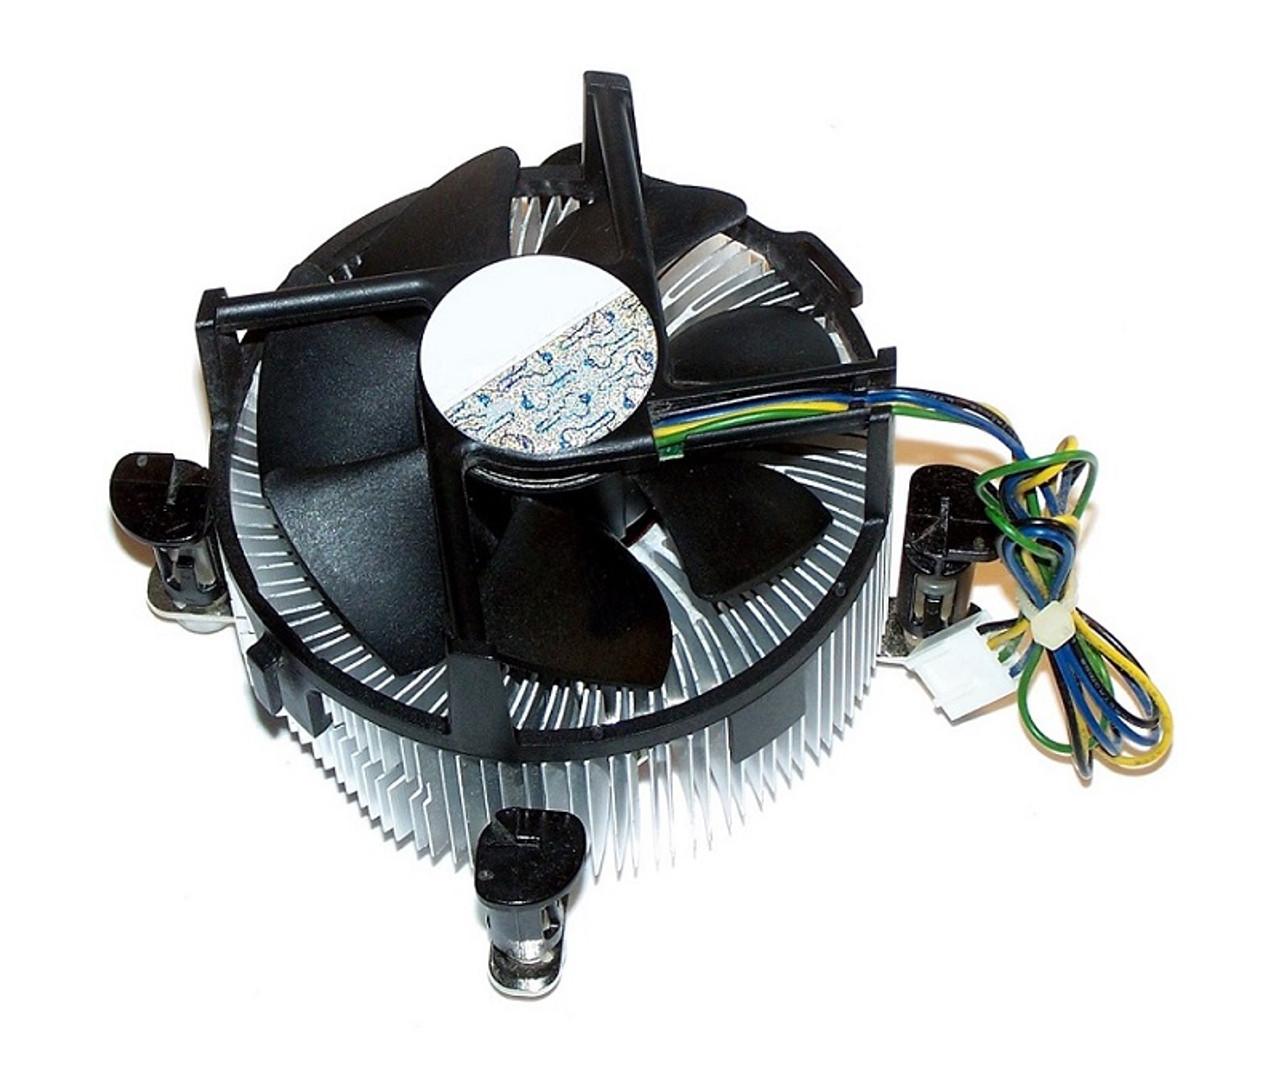 Part No: 732443-001 - HP Heatsink for ProLiant DL580 Gen8 Server